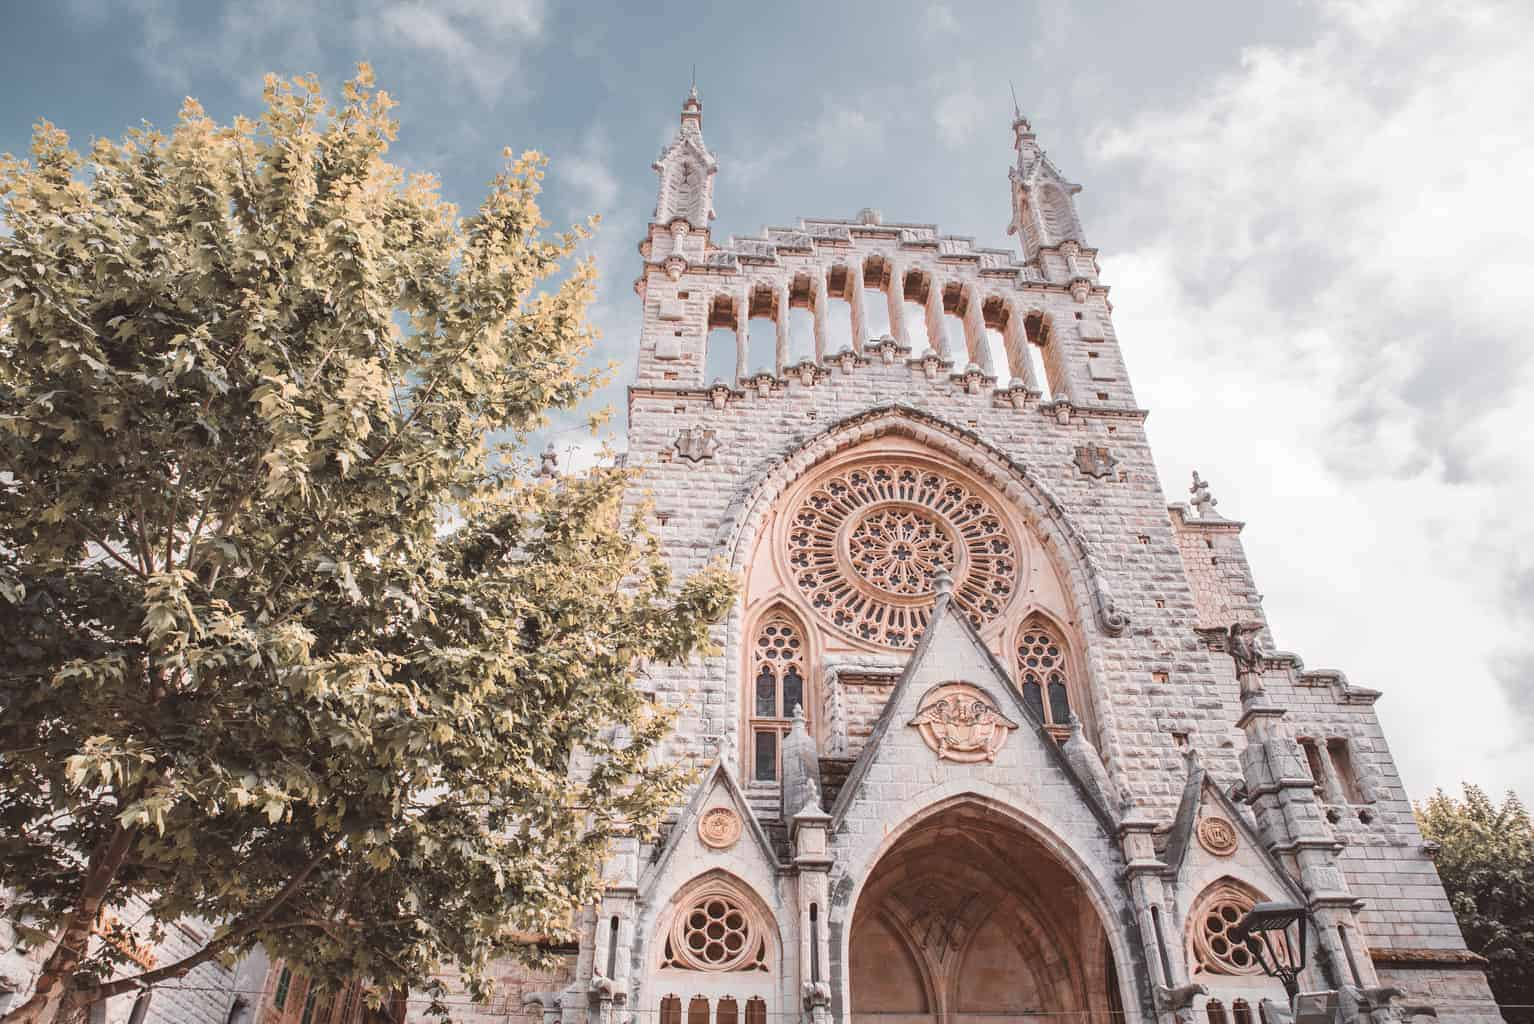 Church in Soller, Majorca